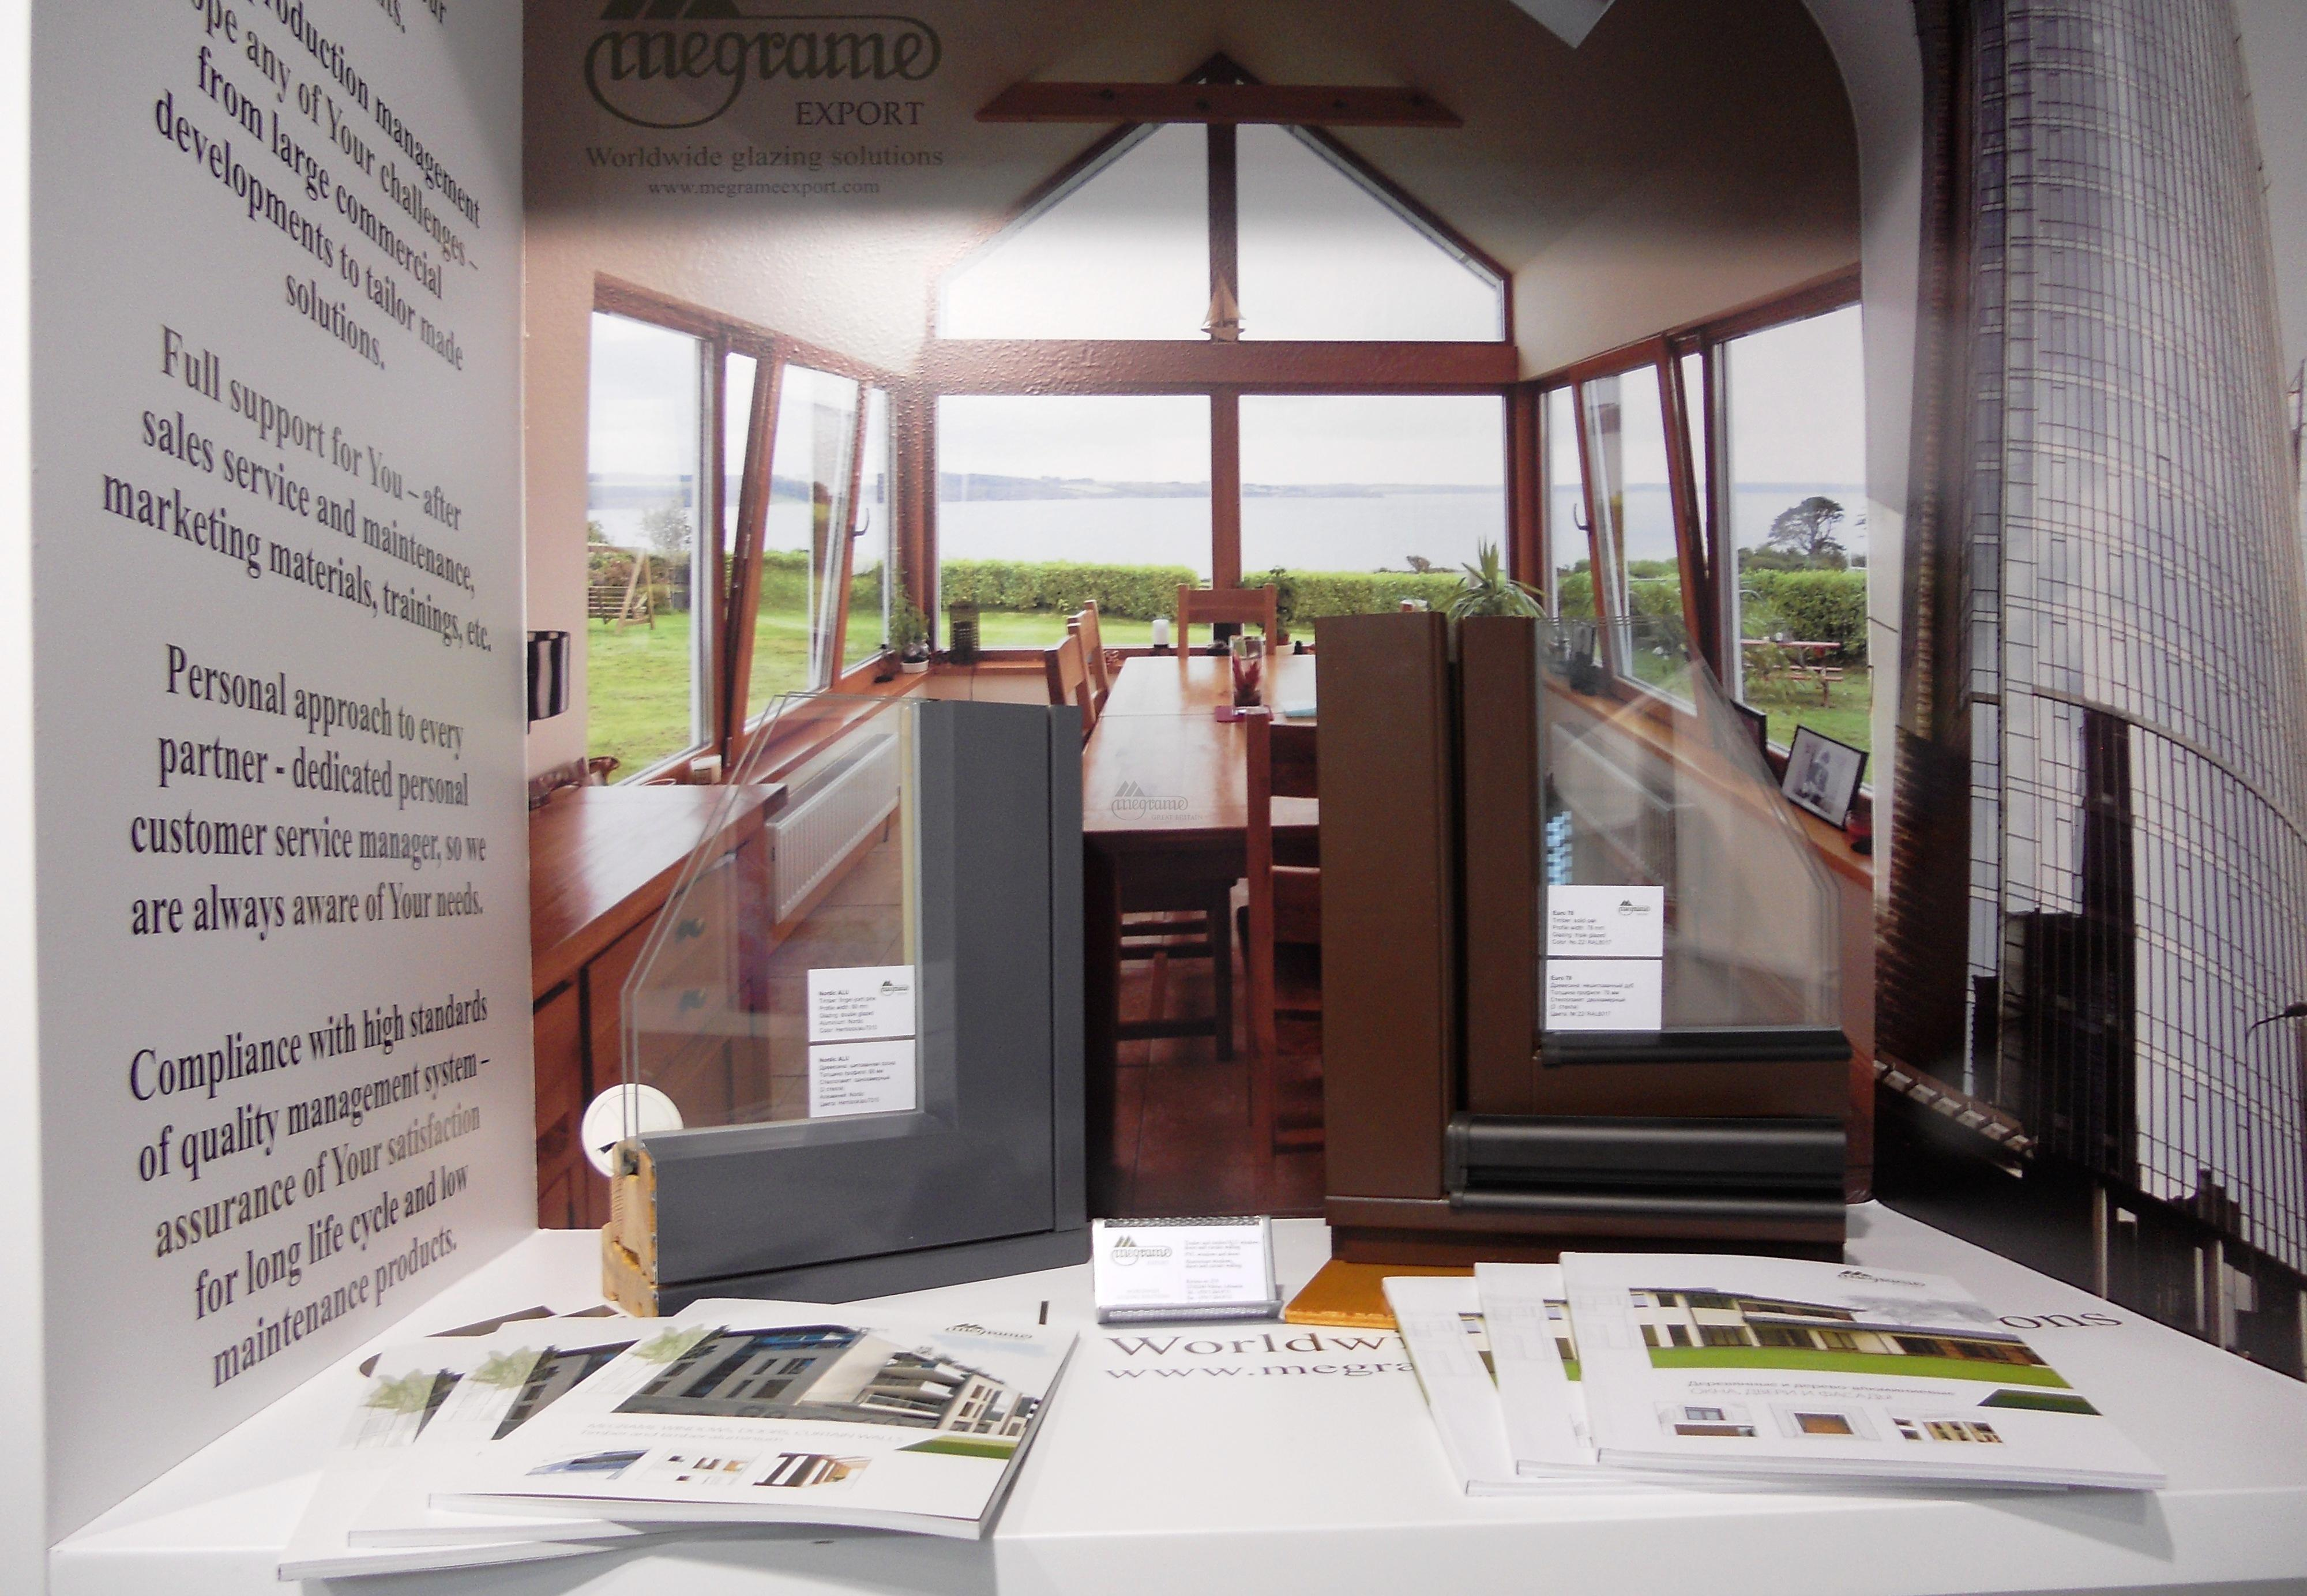 Megrame international exhibits